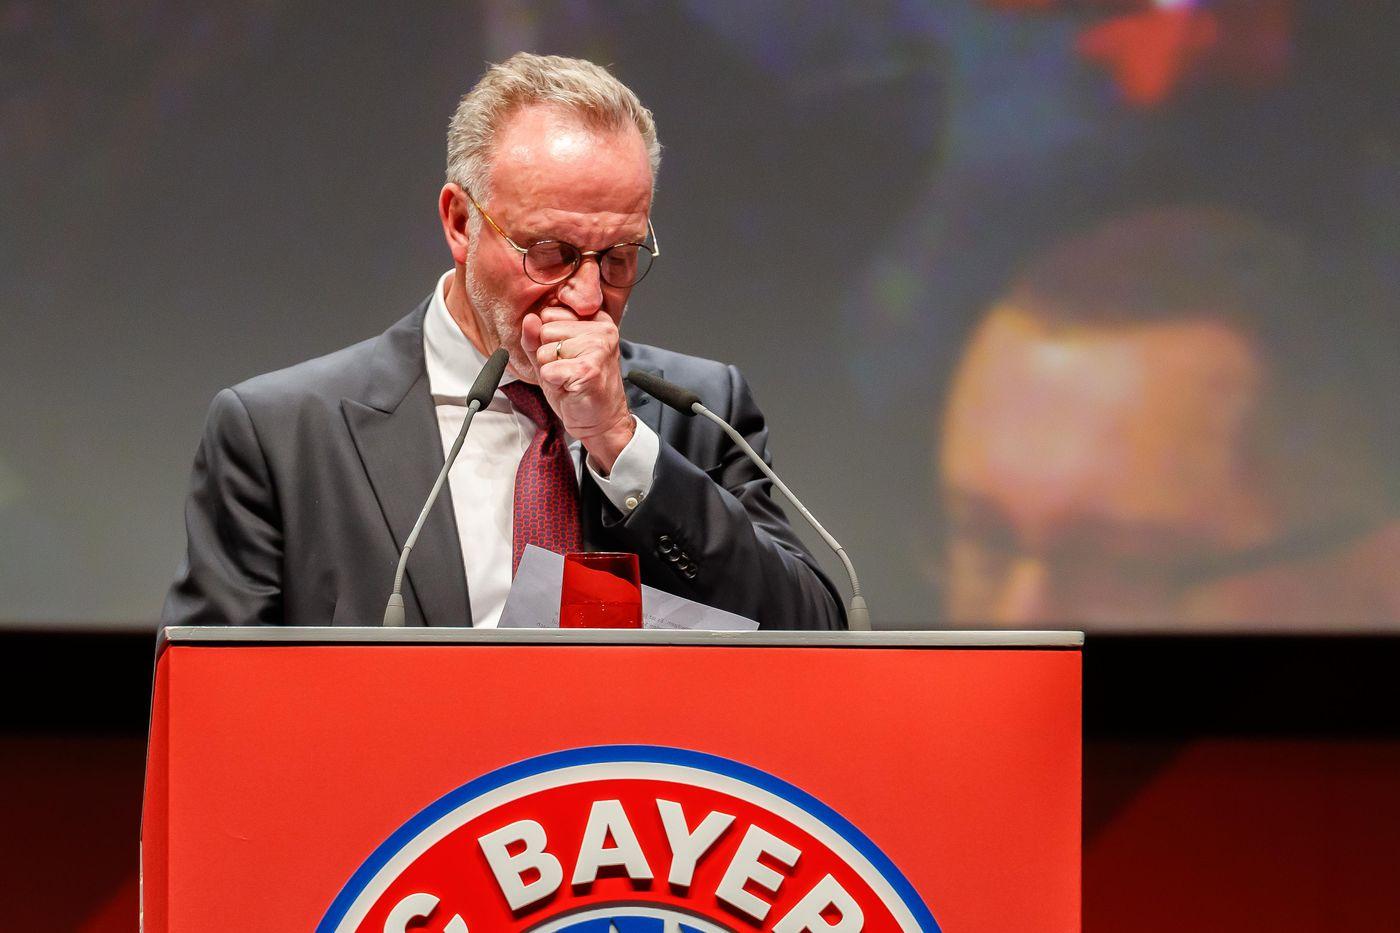 End of an era: Karl-Heinz Rummenigge steps down as Bayern Munich CEO -  Bavarian Football Works